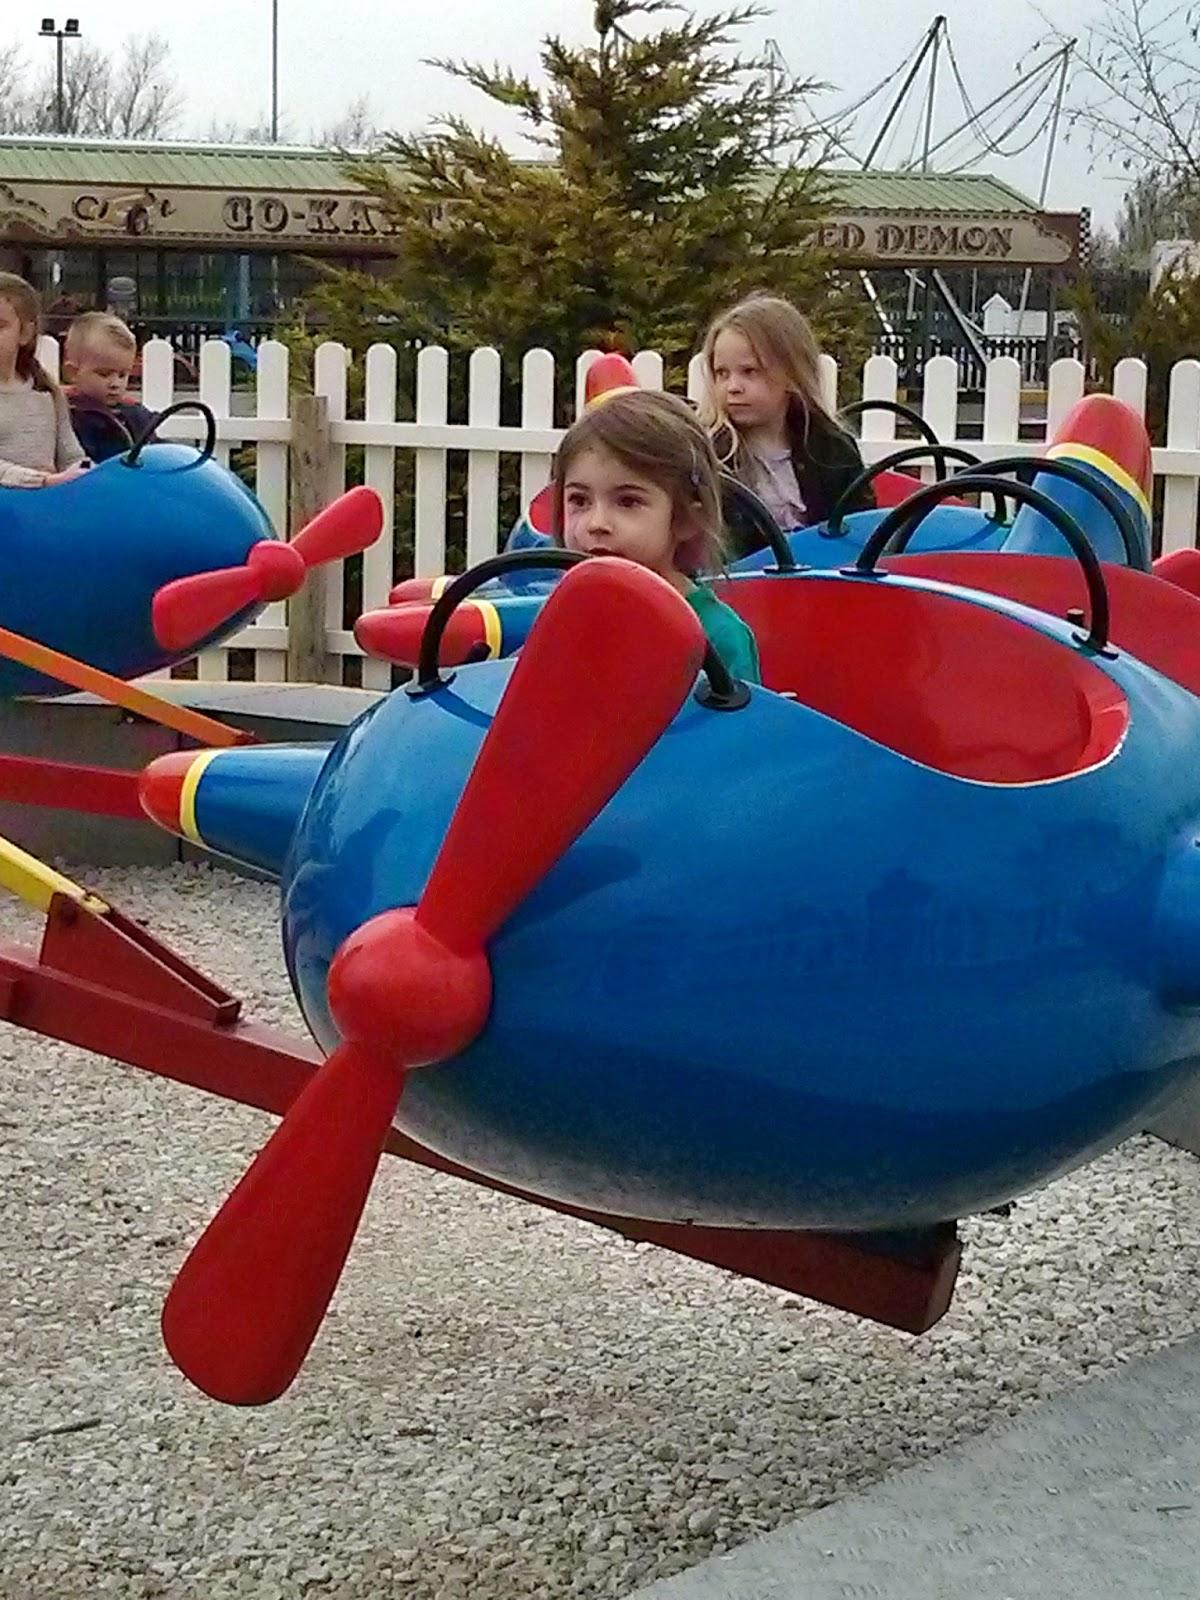 Fairground plane